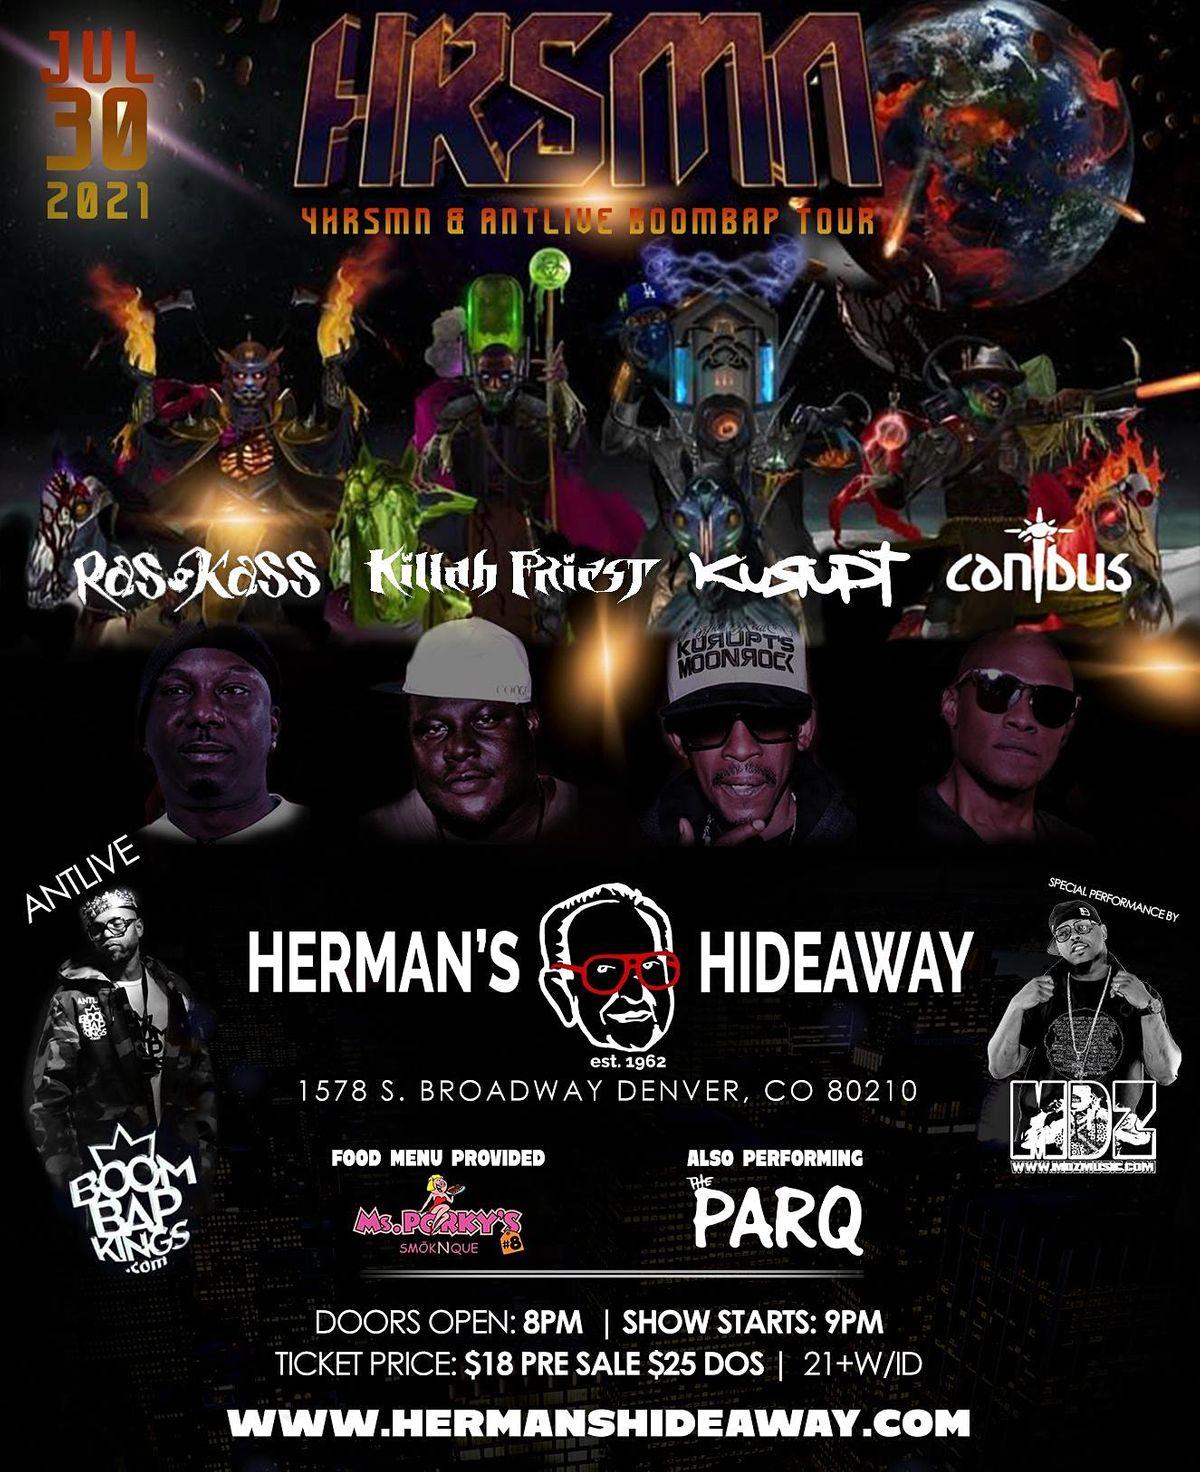 4HRSMN & ANTLIVE BOOMBAP TOUR